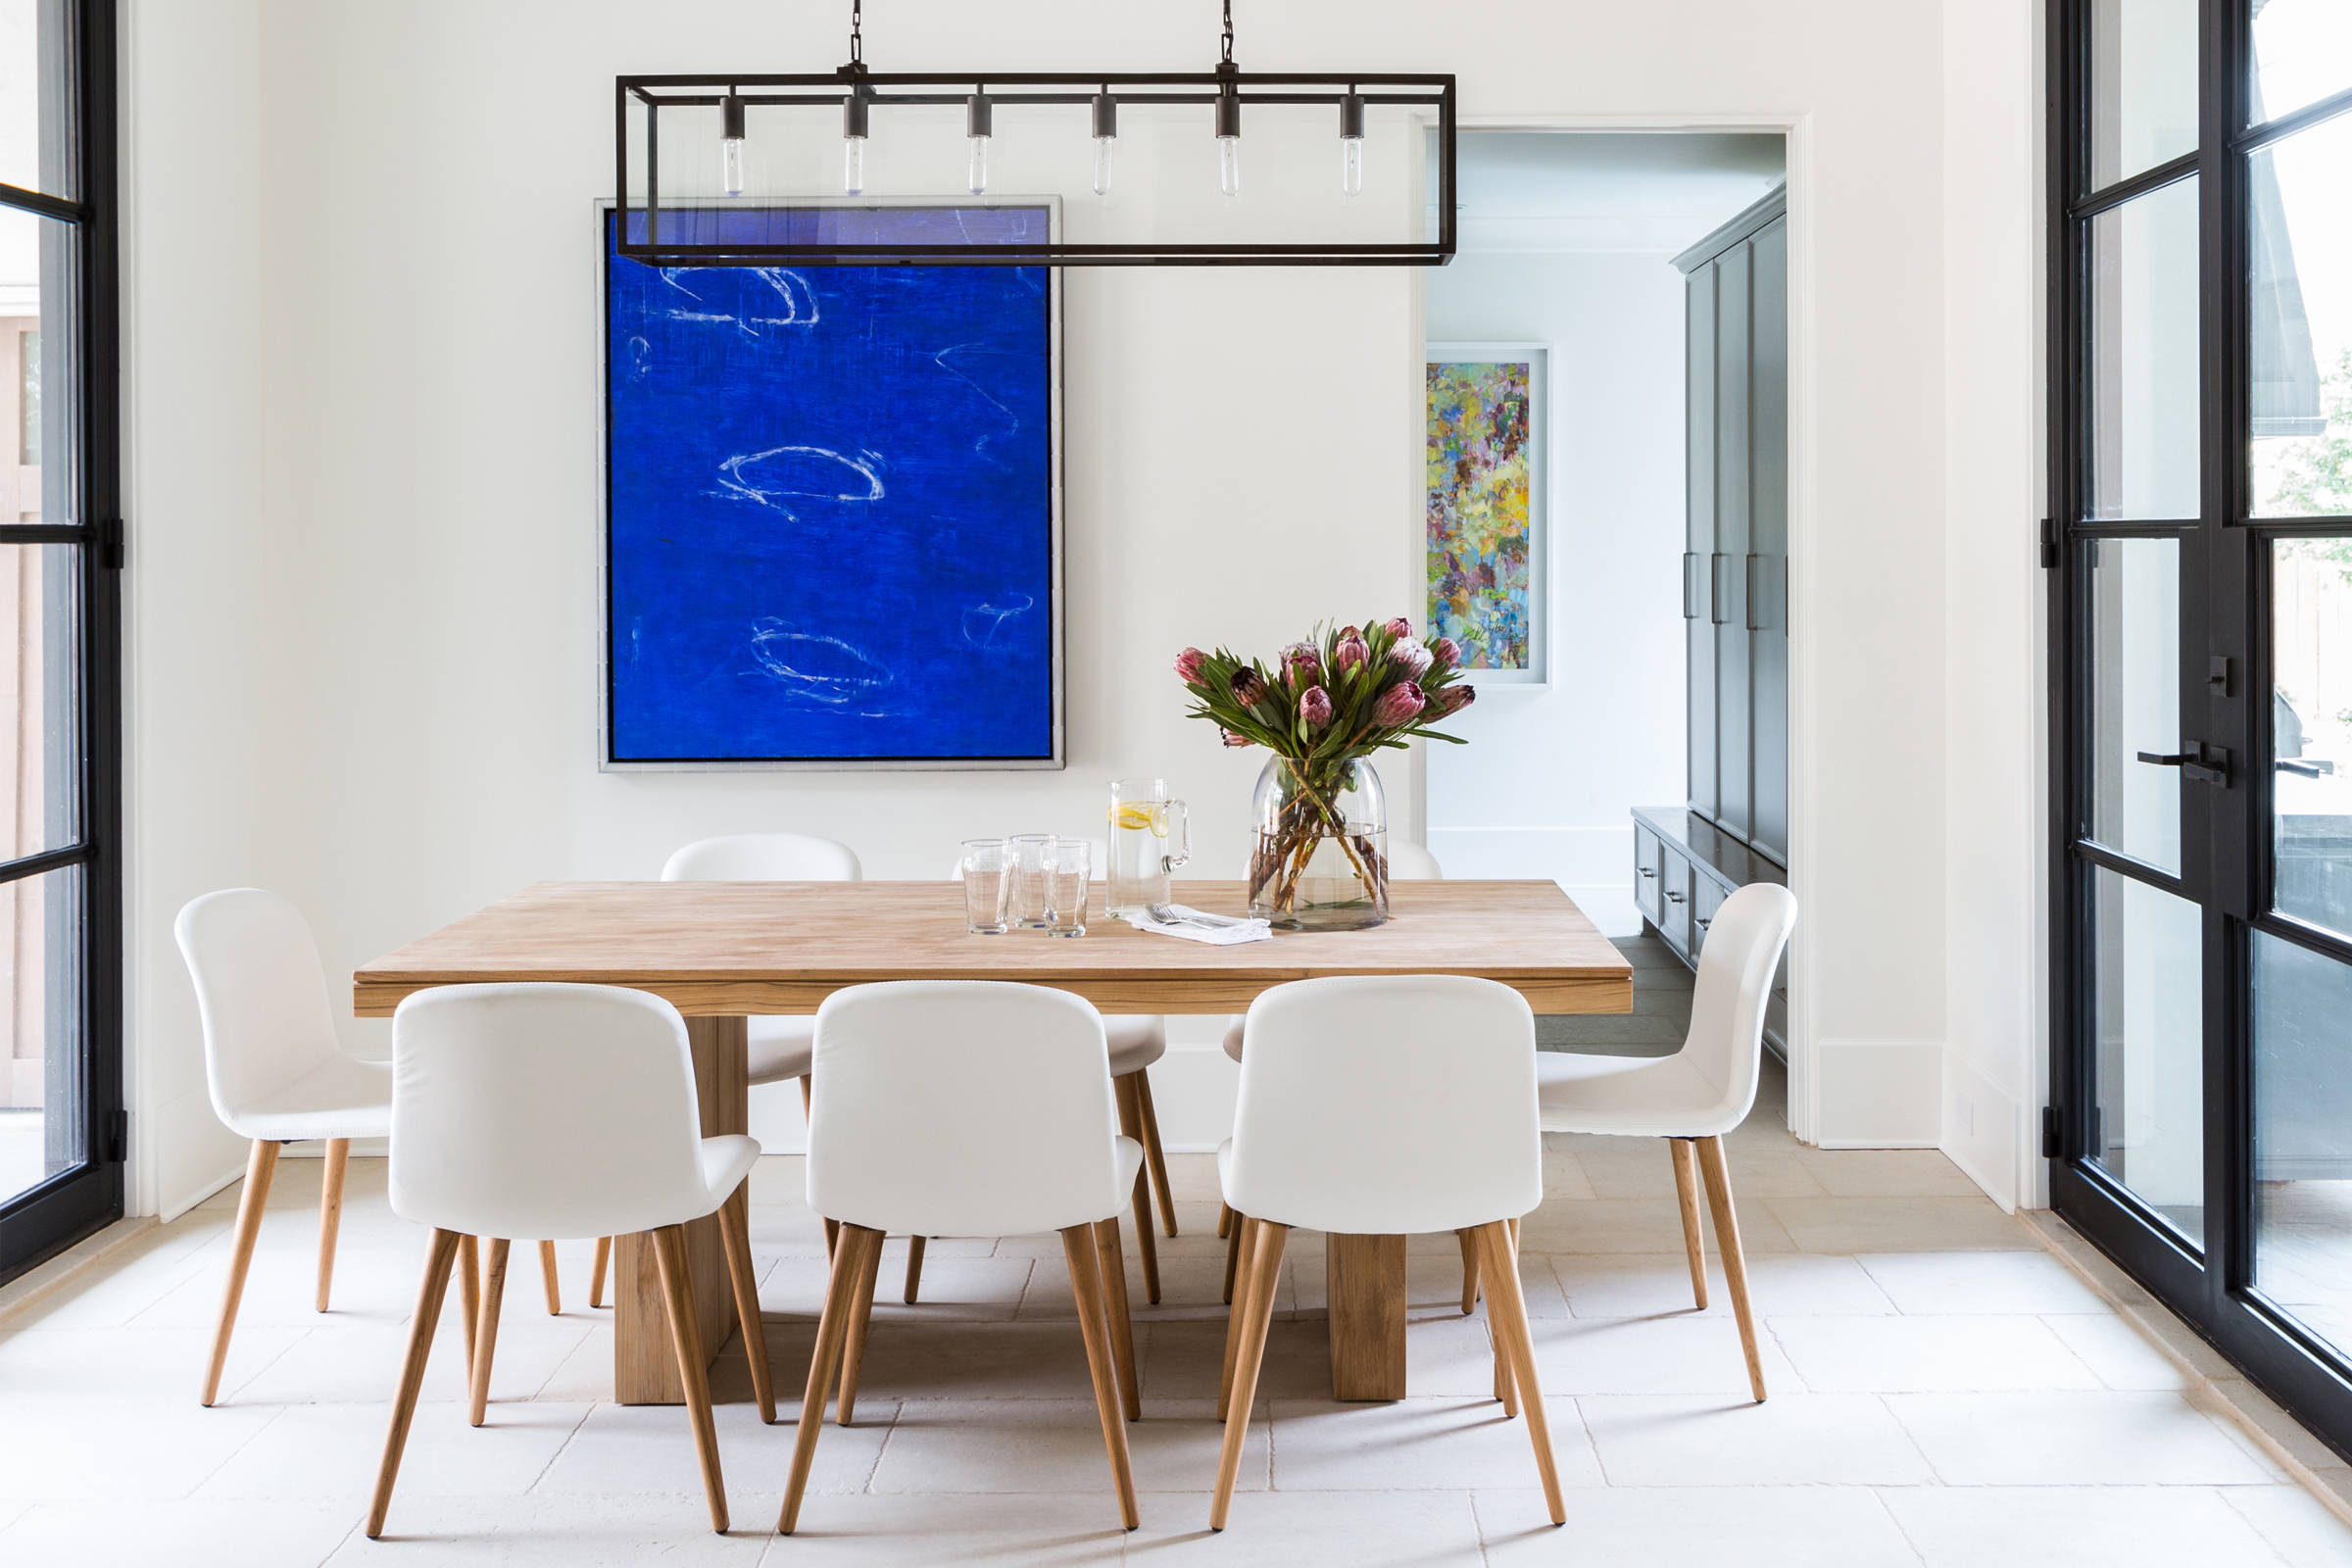 Award-Winning-Interior-Design-Marie-Flanigan-Dining-Room-Steel-Doors-Bold-Art-Contemporary-Furnishings.jpg